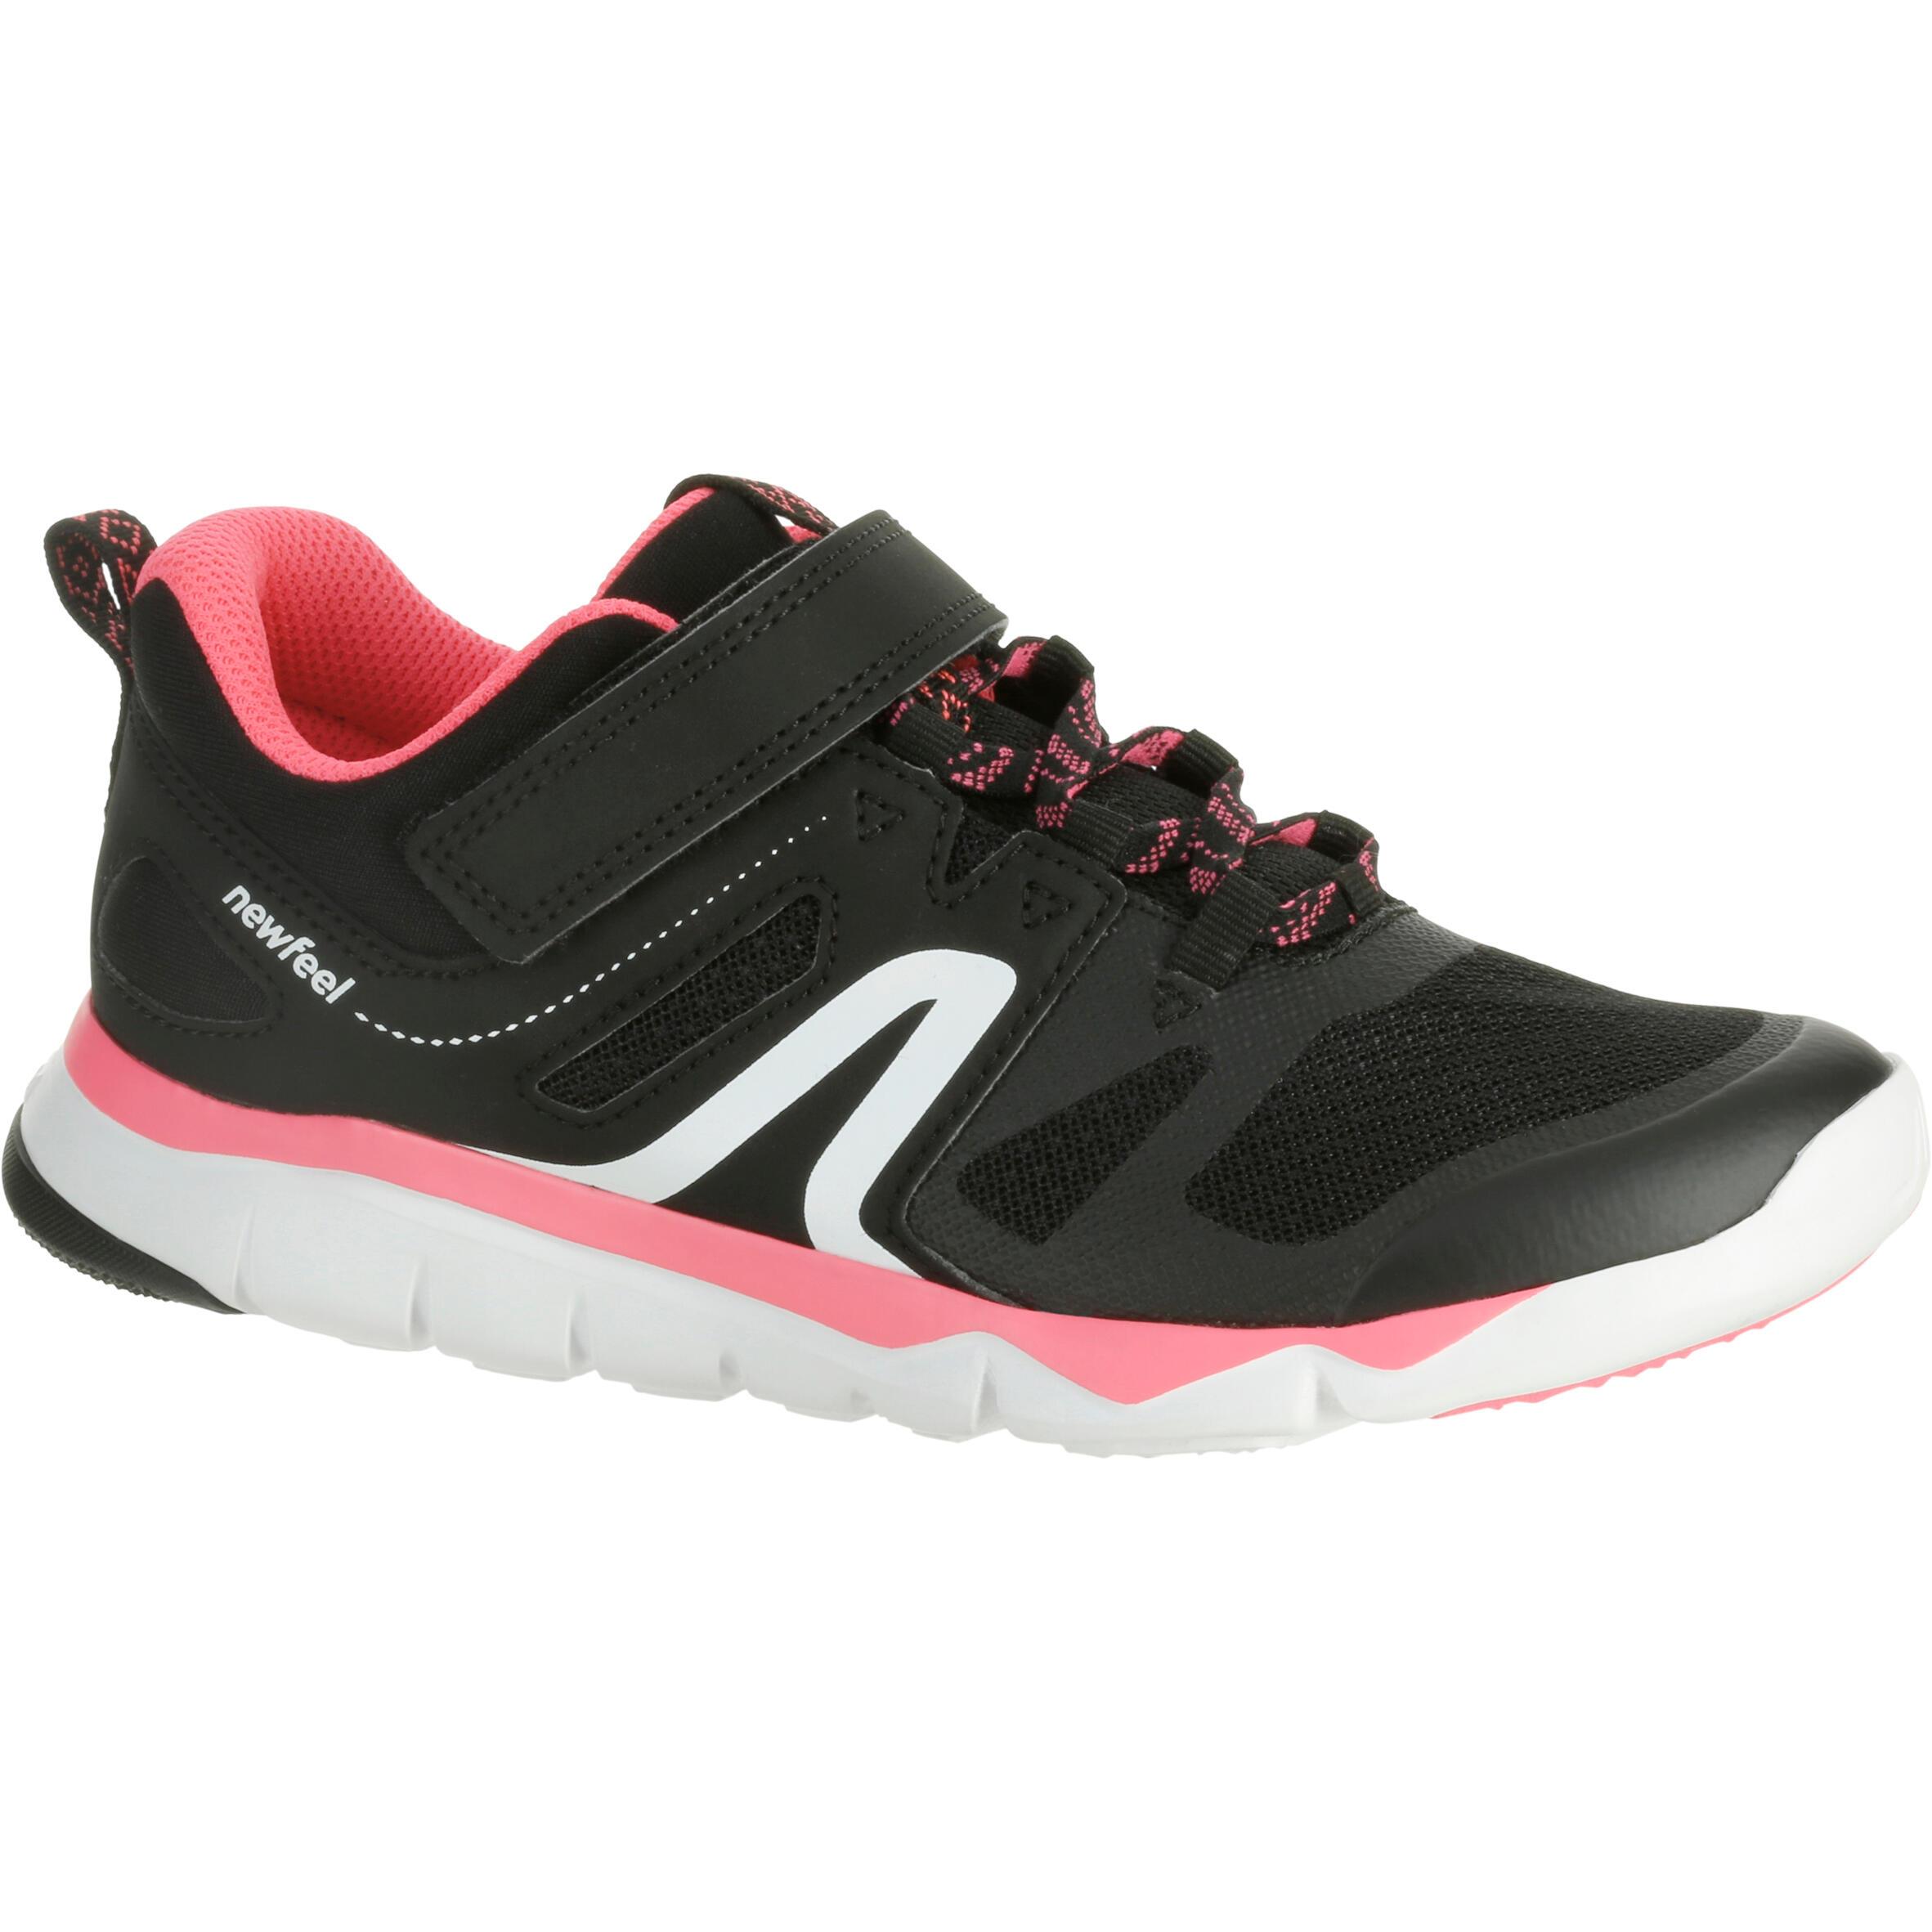 Tenis de caminata deportiva para niños PW 540 negro / rosa